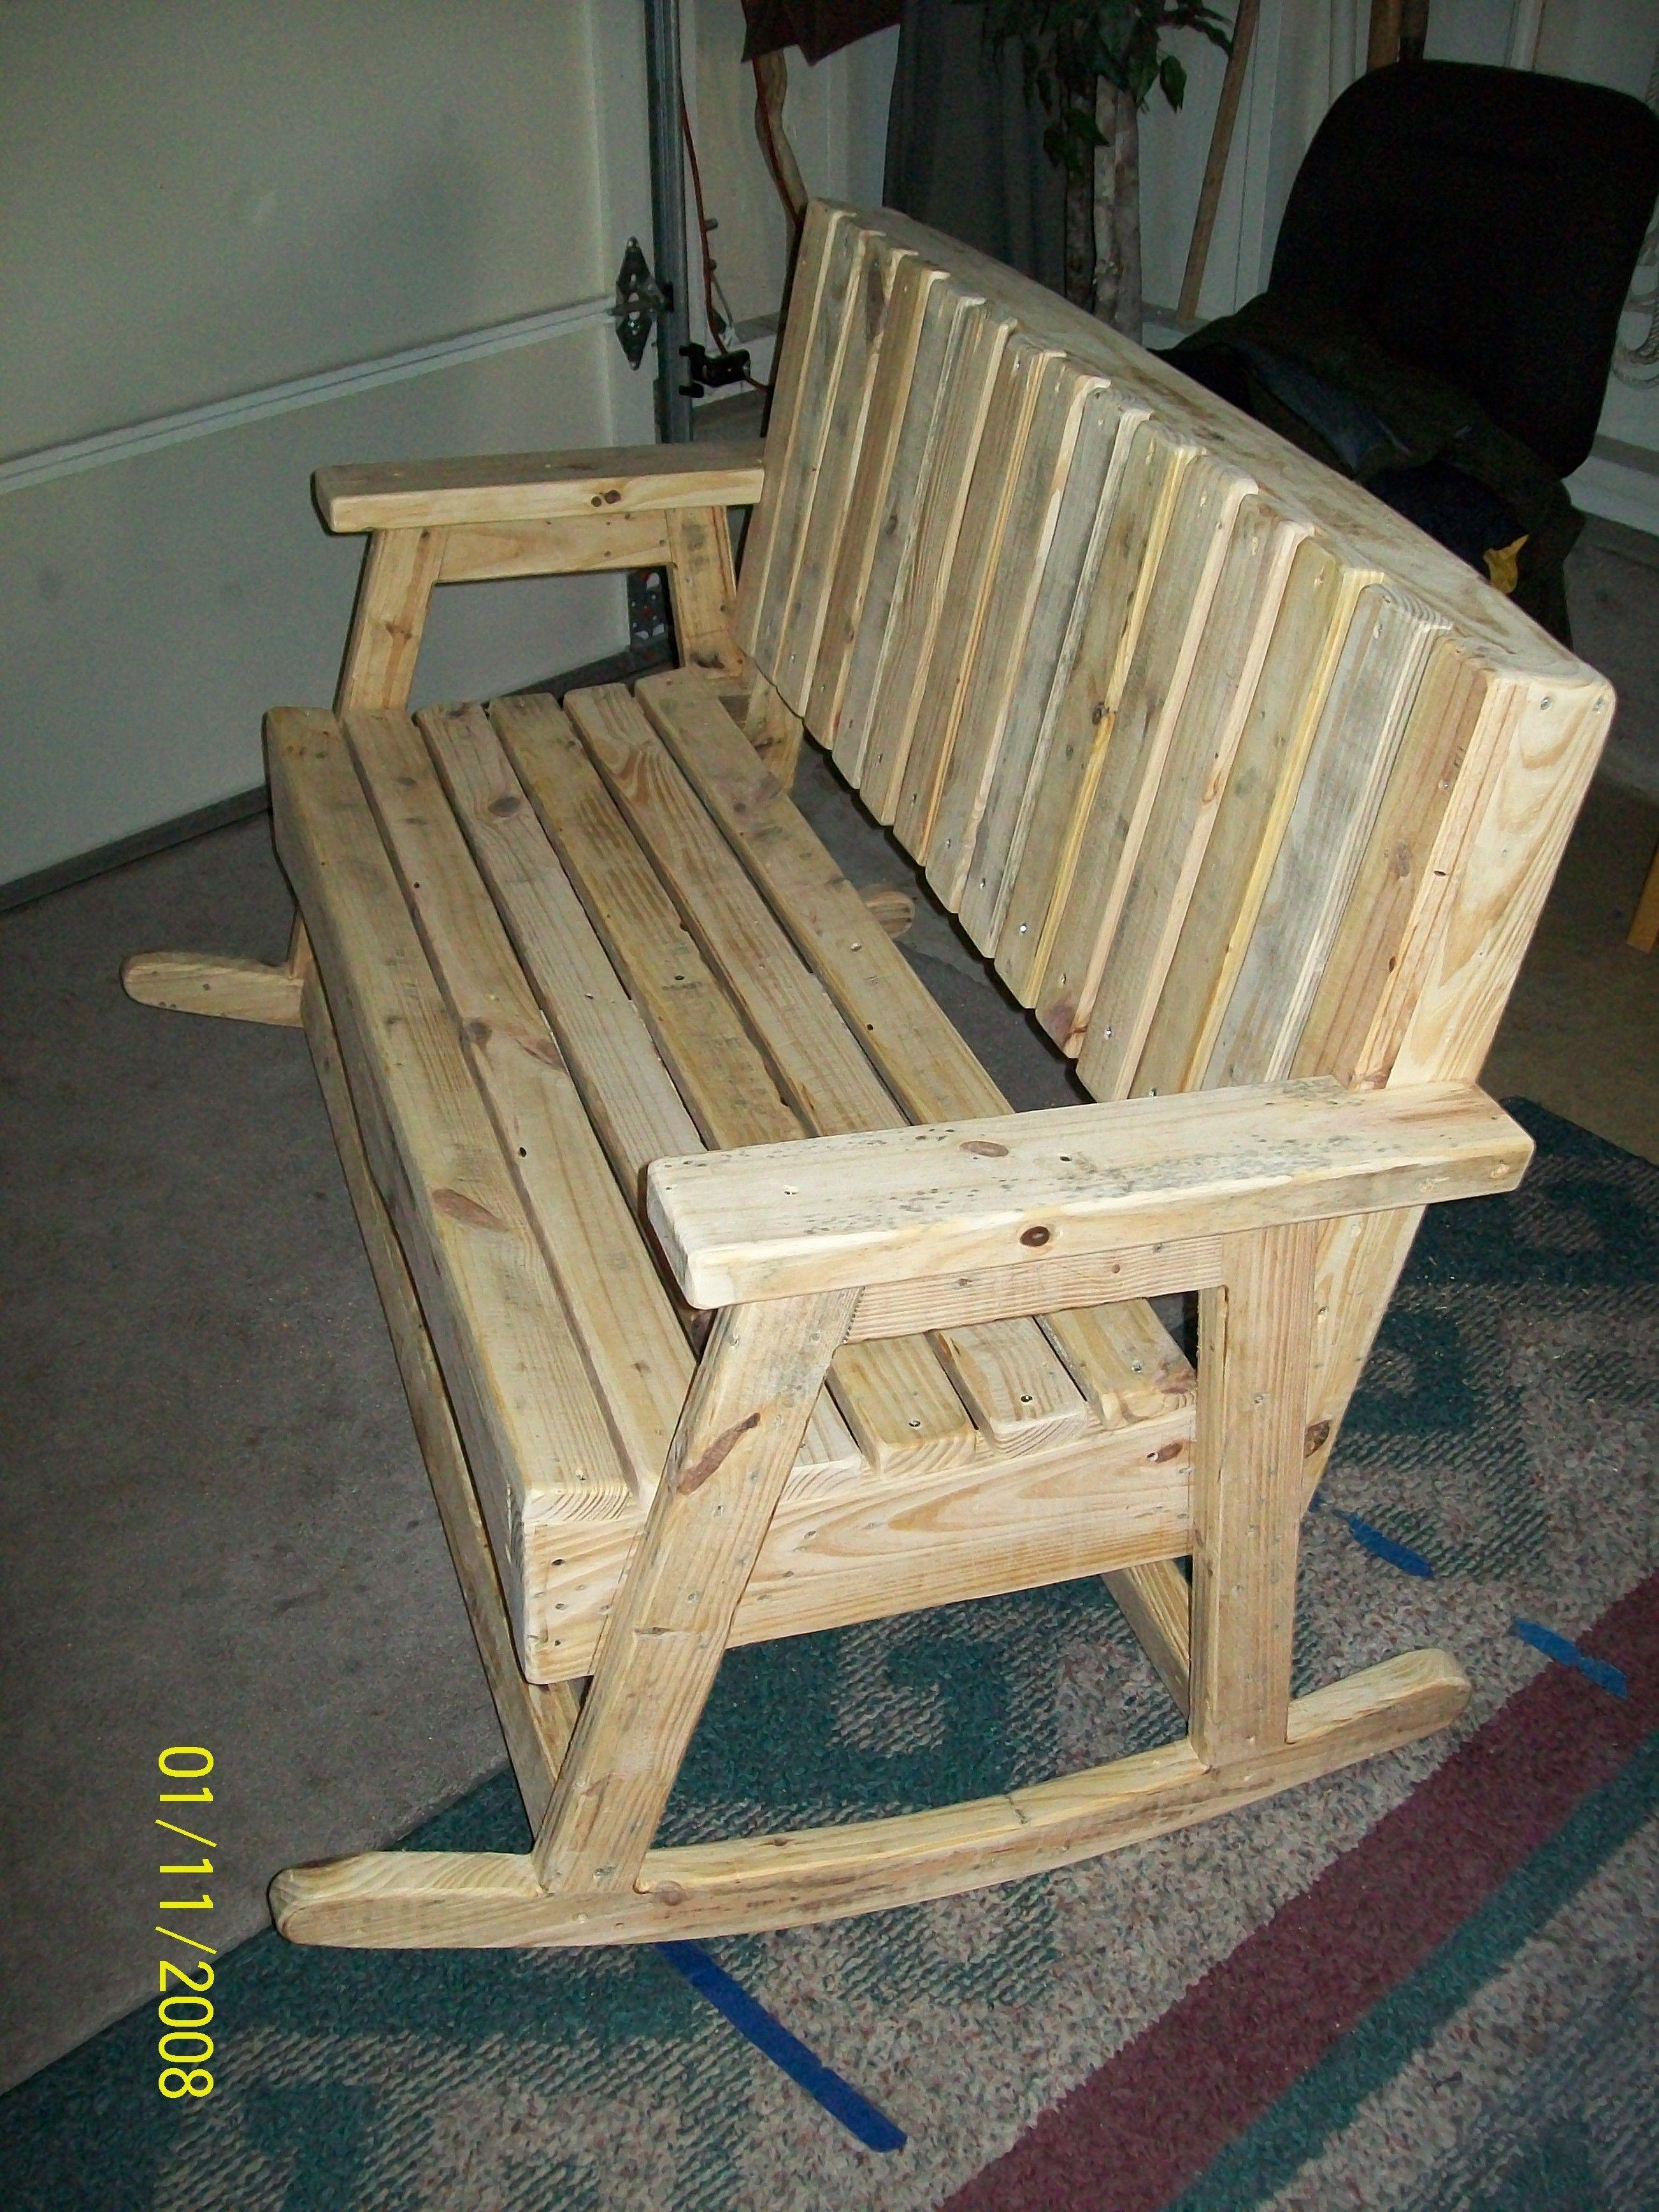 Diy pallet furniture image by mark on Garden | Pallet ...